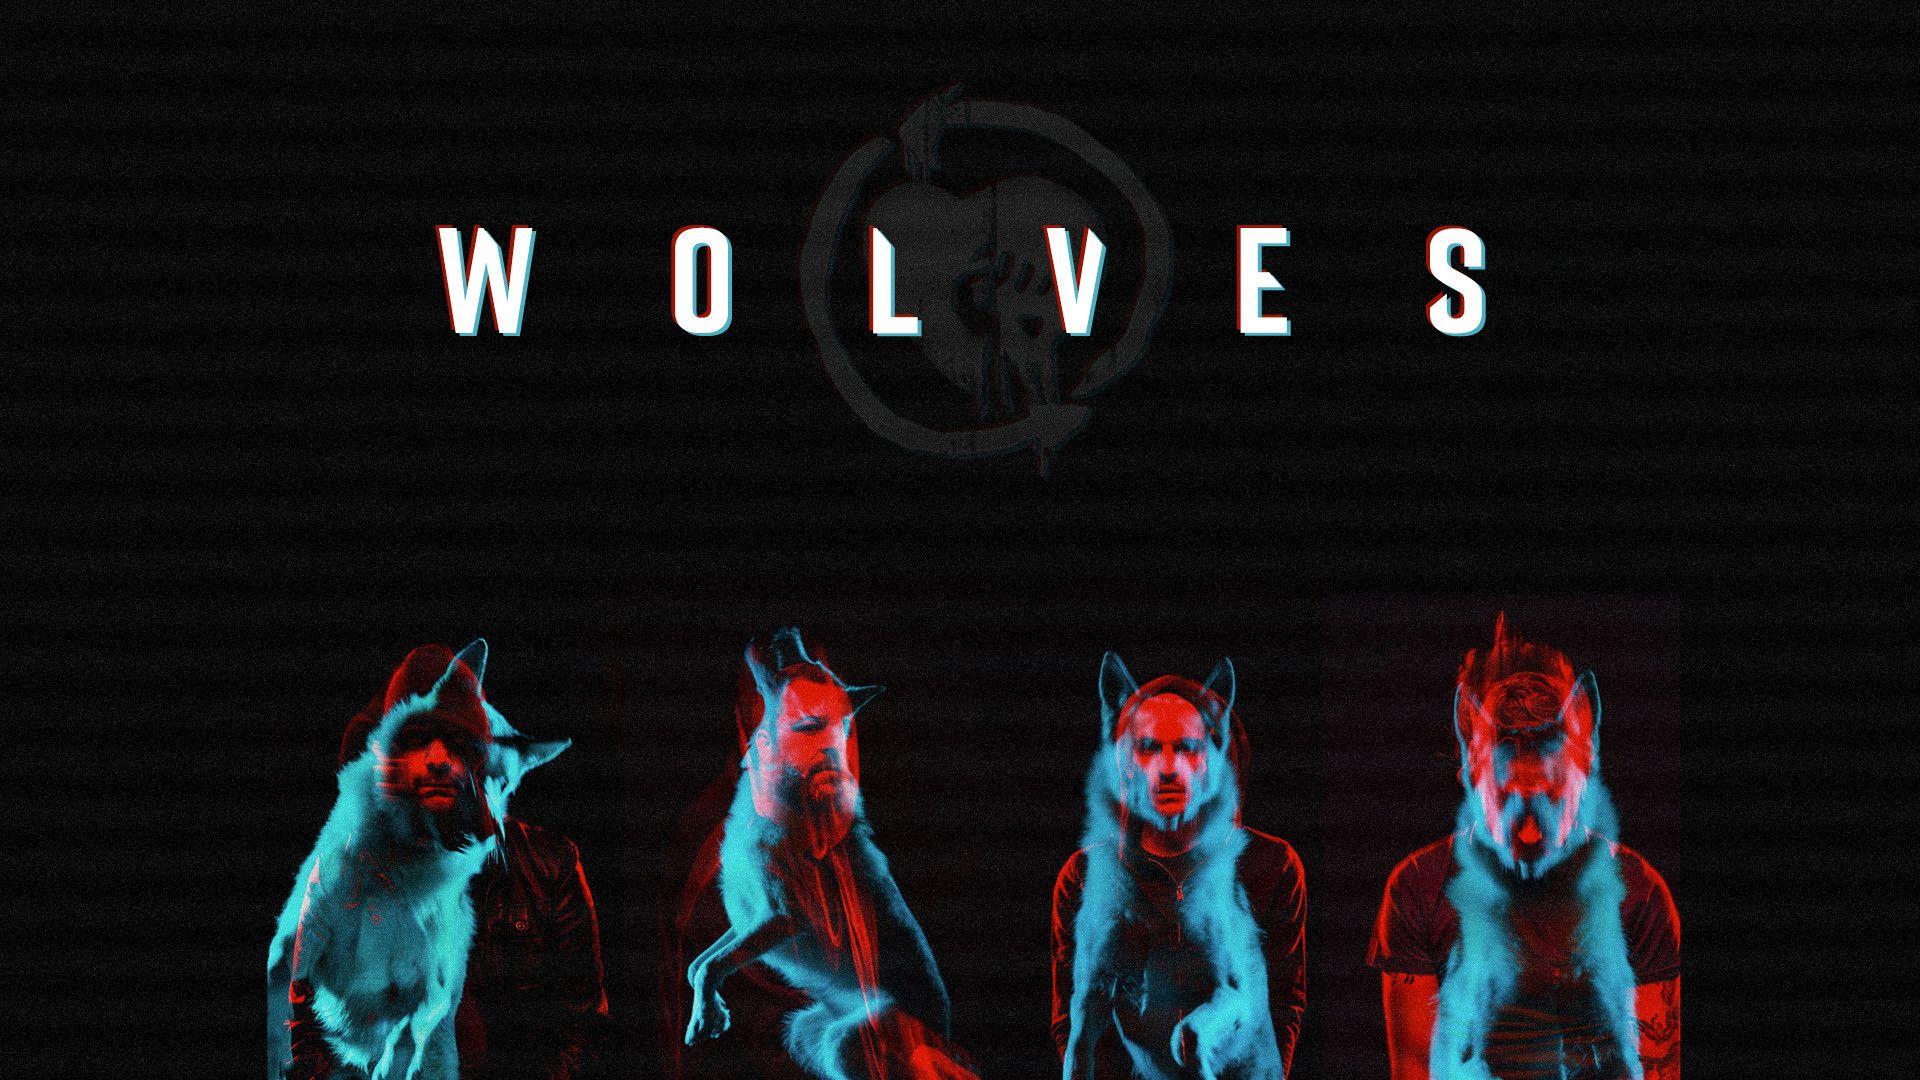 Pubg Wallpaper For Iphone 6s Plus: Wolves Desktop Wallpaper (1920x1080) Need #iPhone #6S